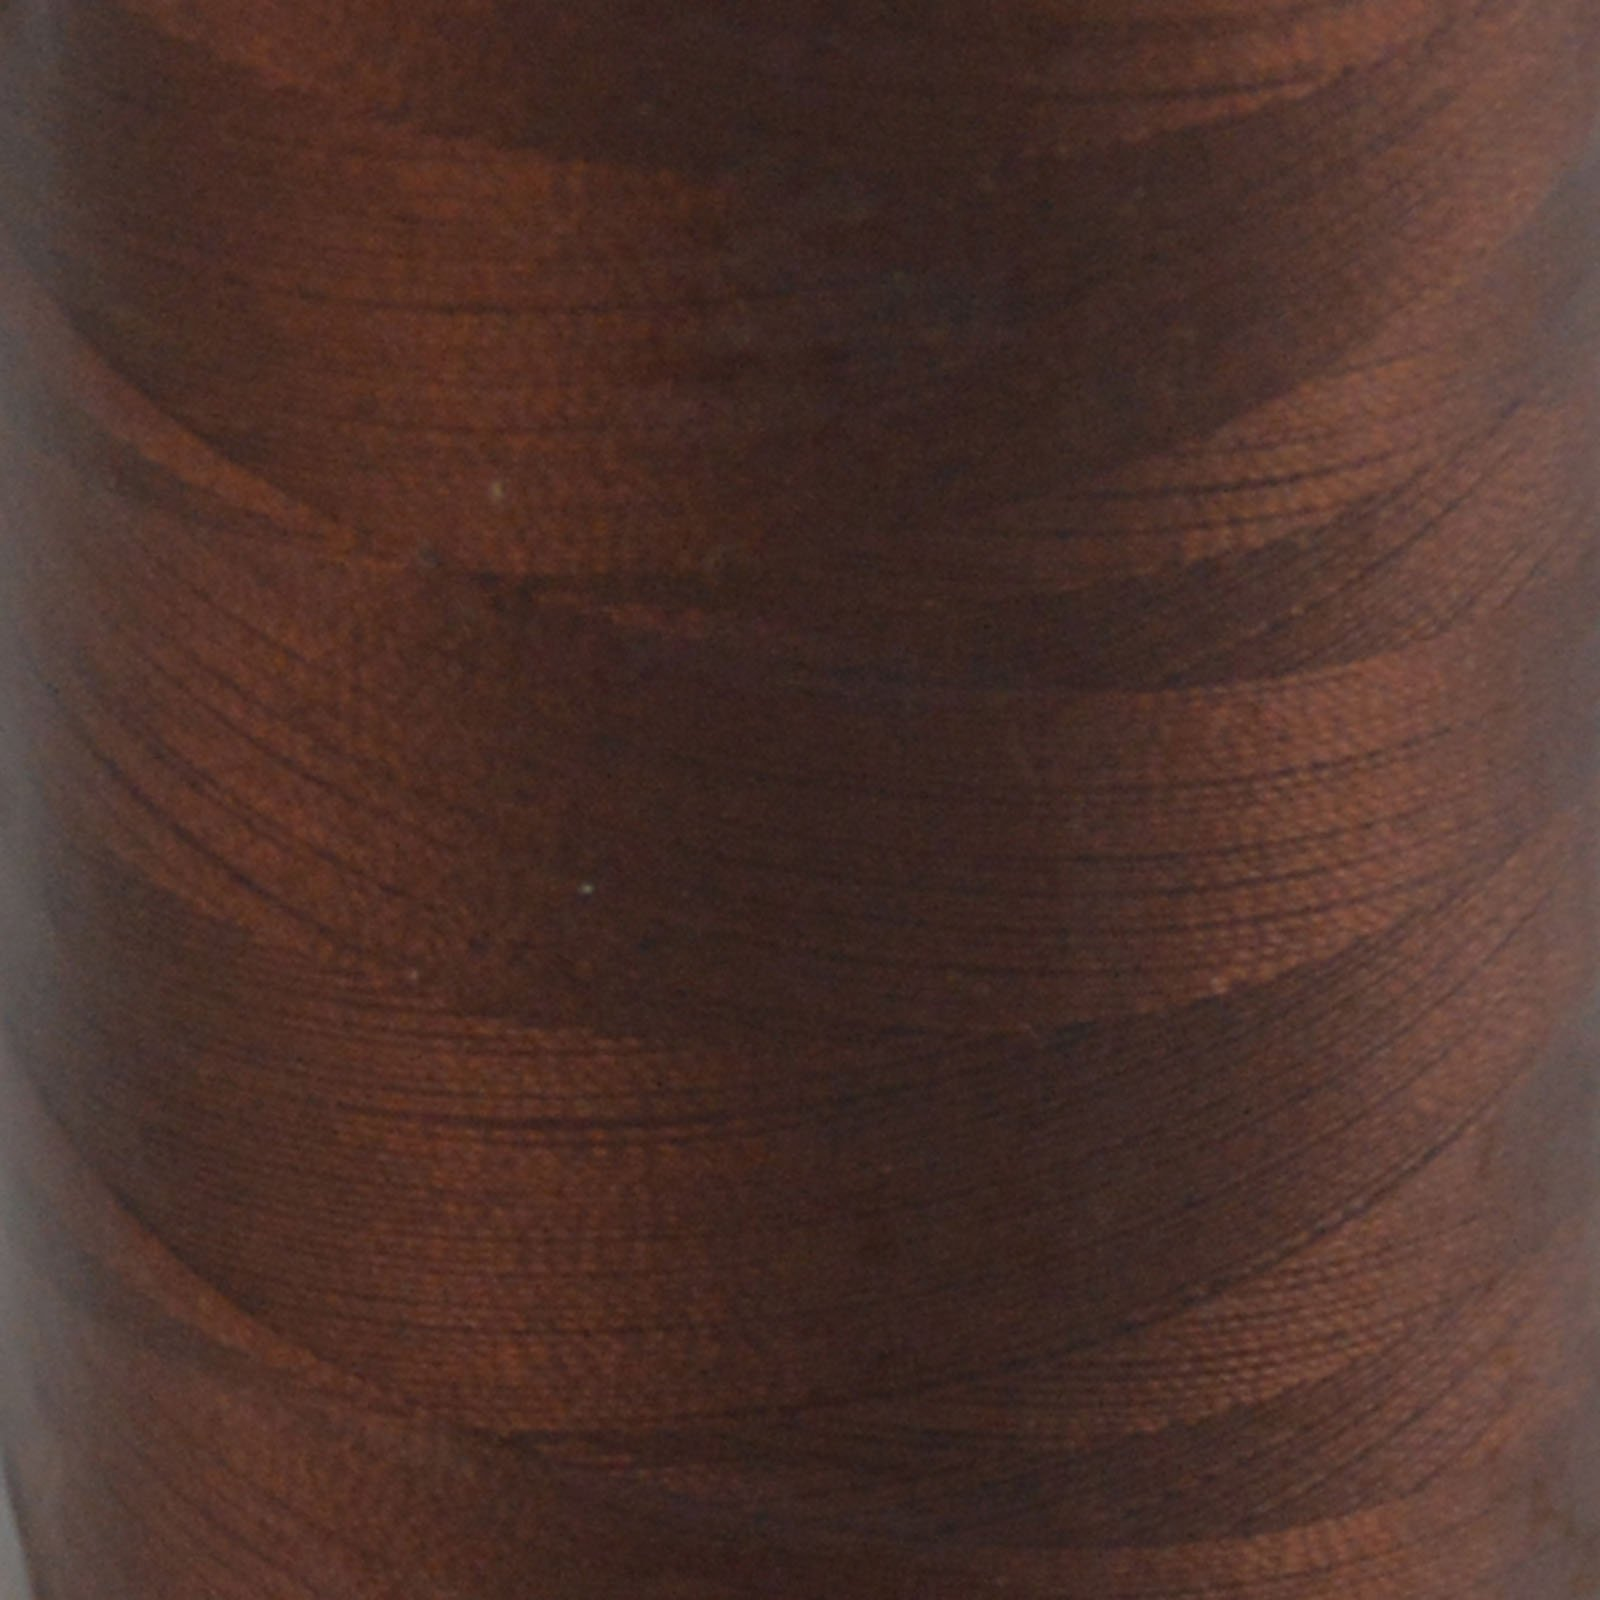 # 2355 Rust